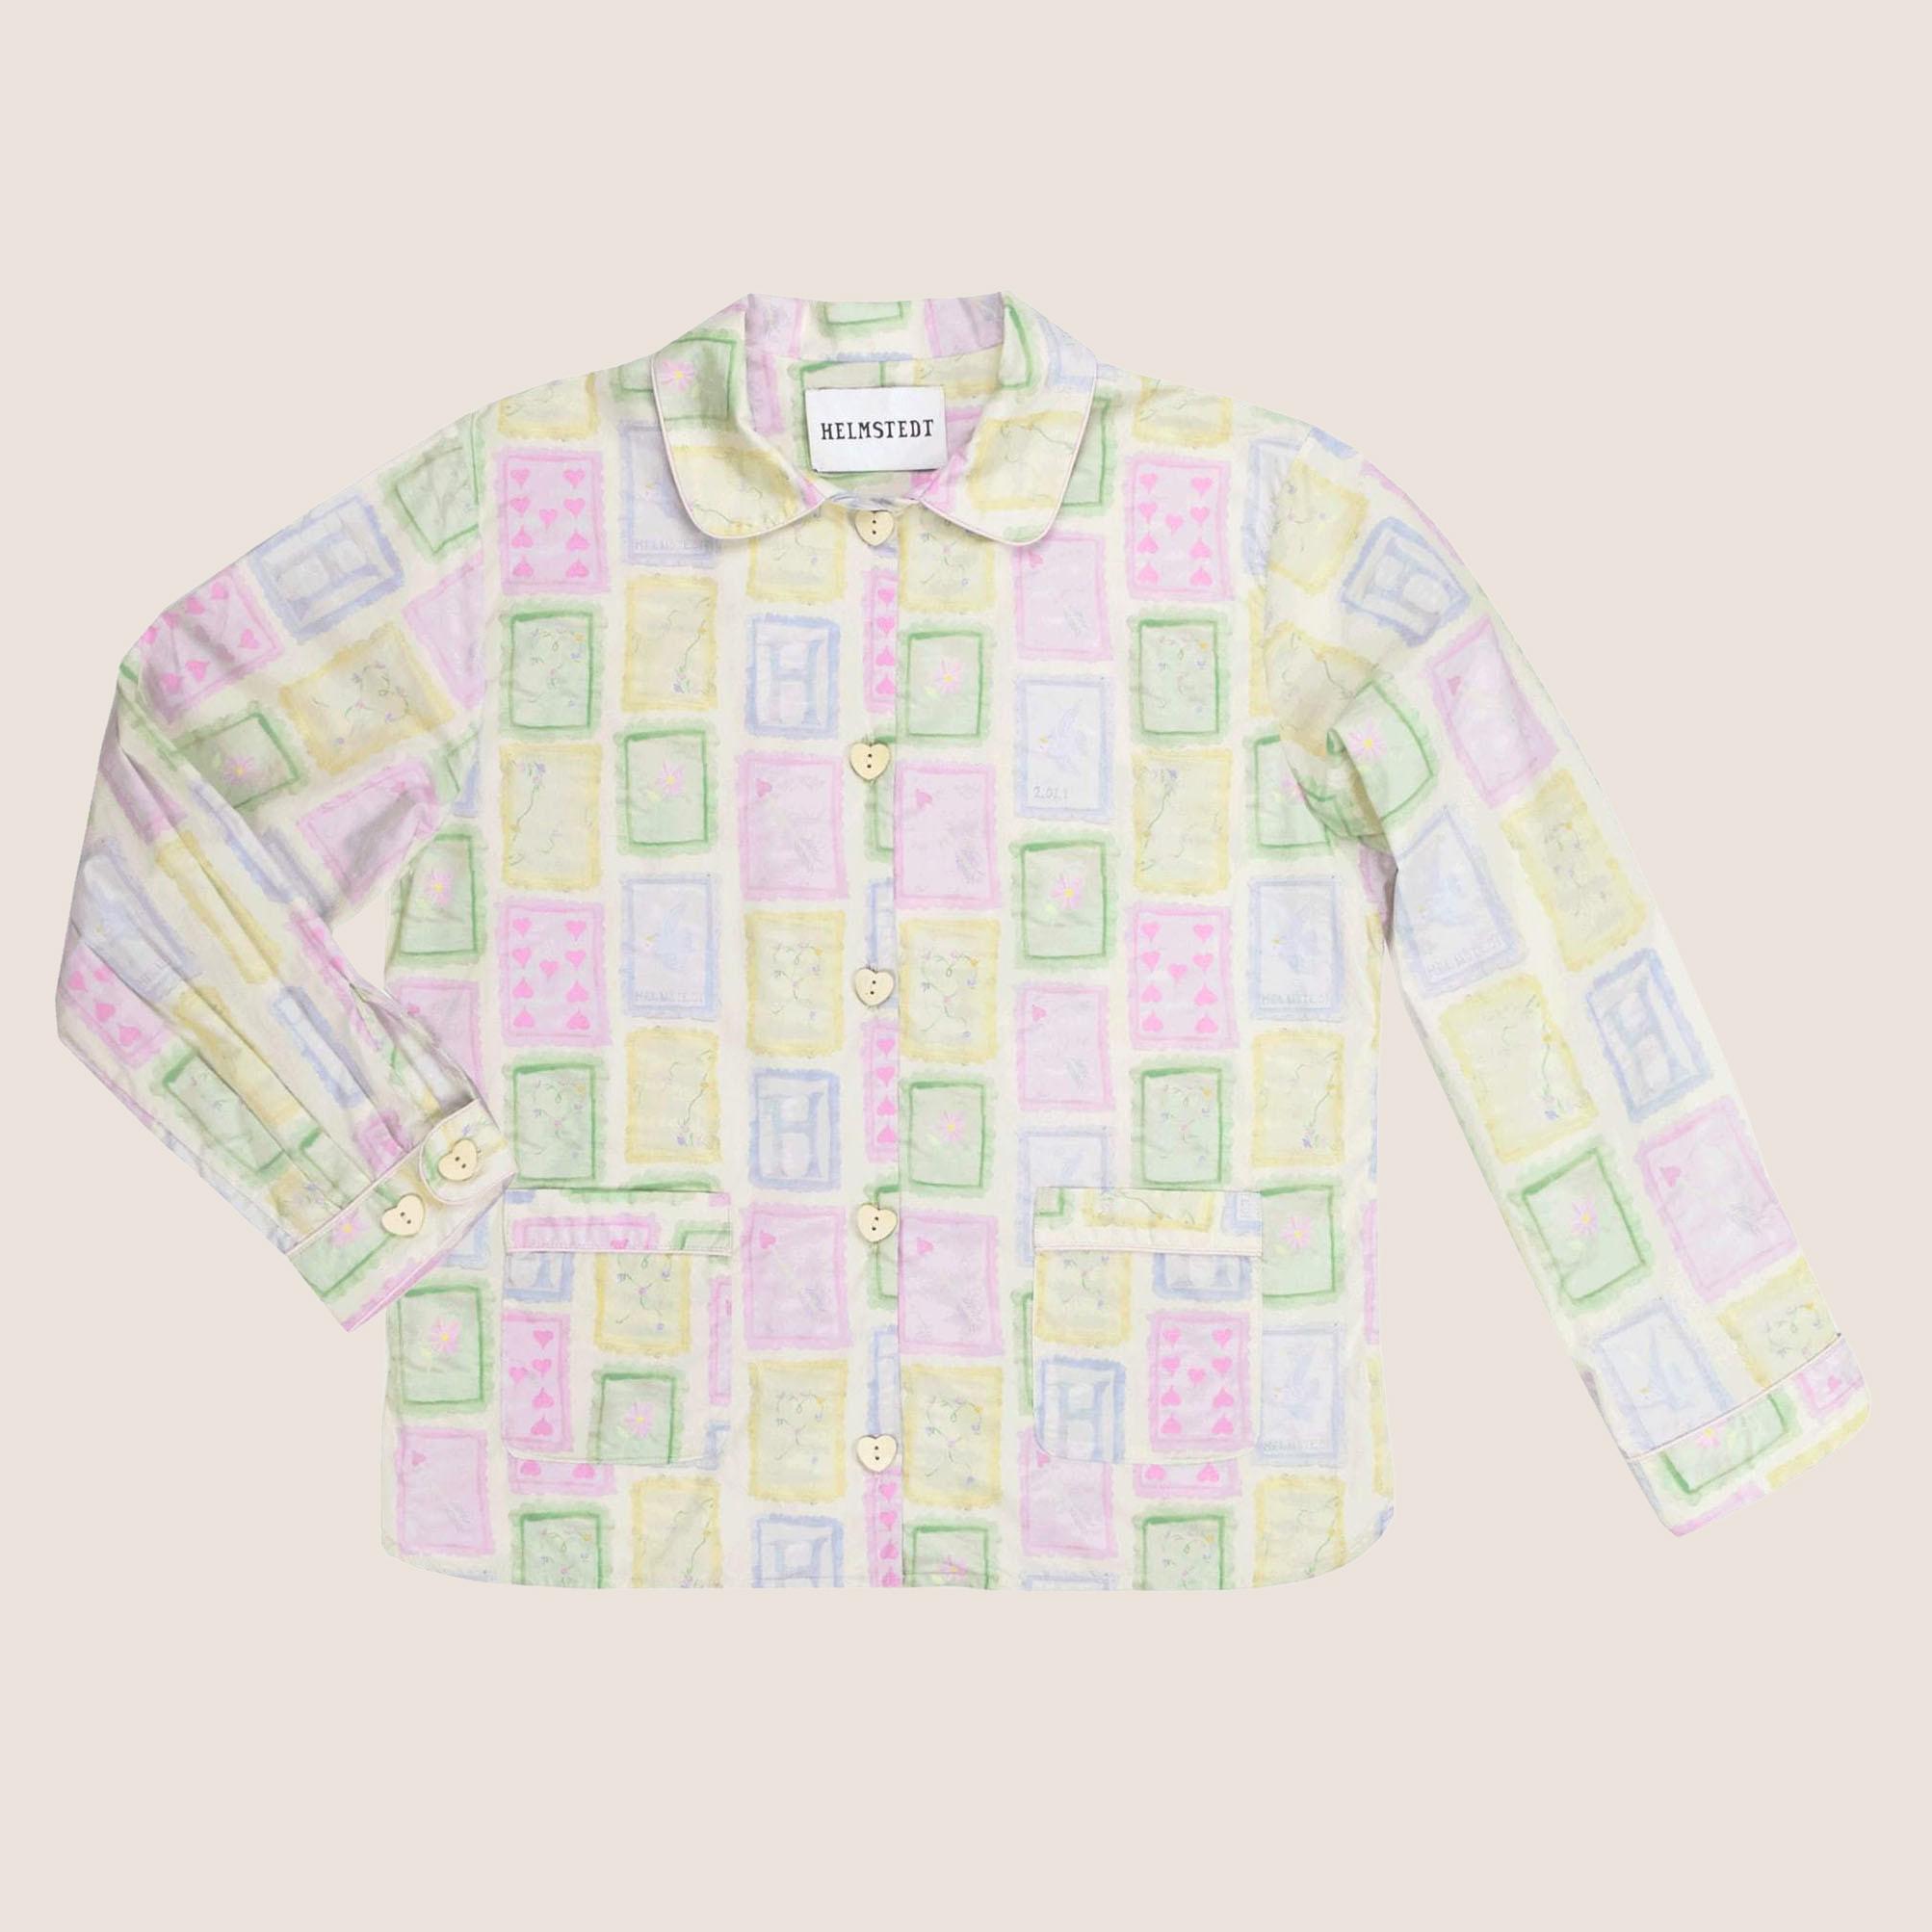 Nomi Shirt - Stamp